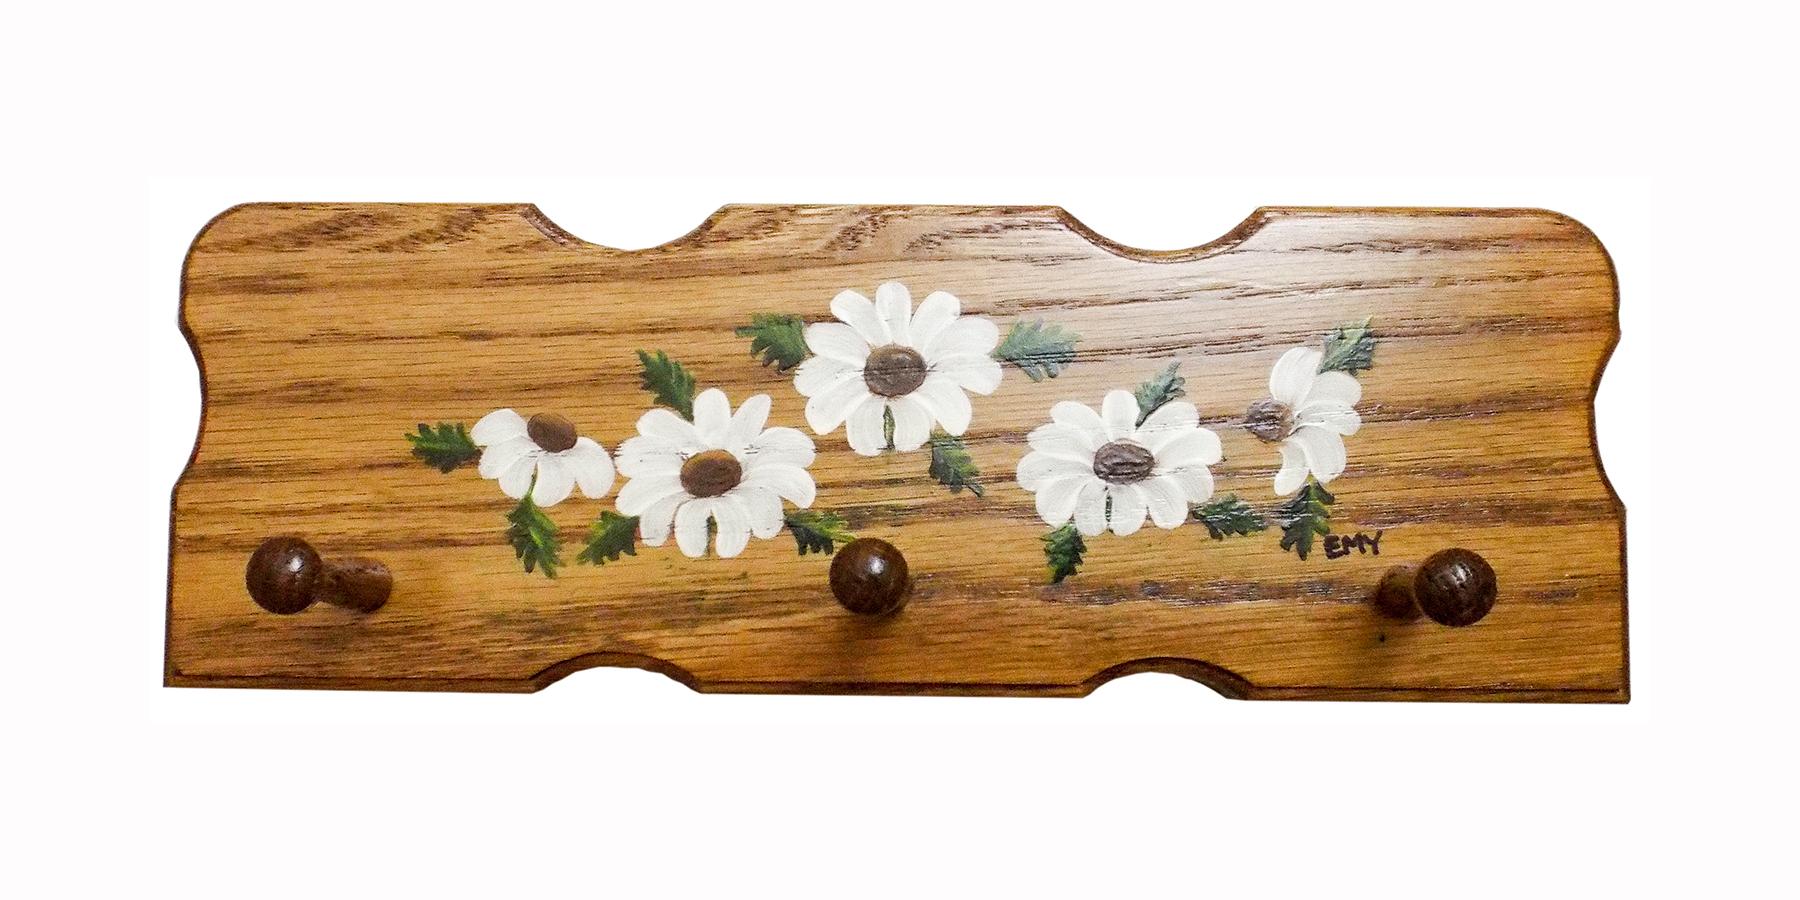 Amish crib for sale - Hand Painted Apple Oak Key Holder Rack